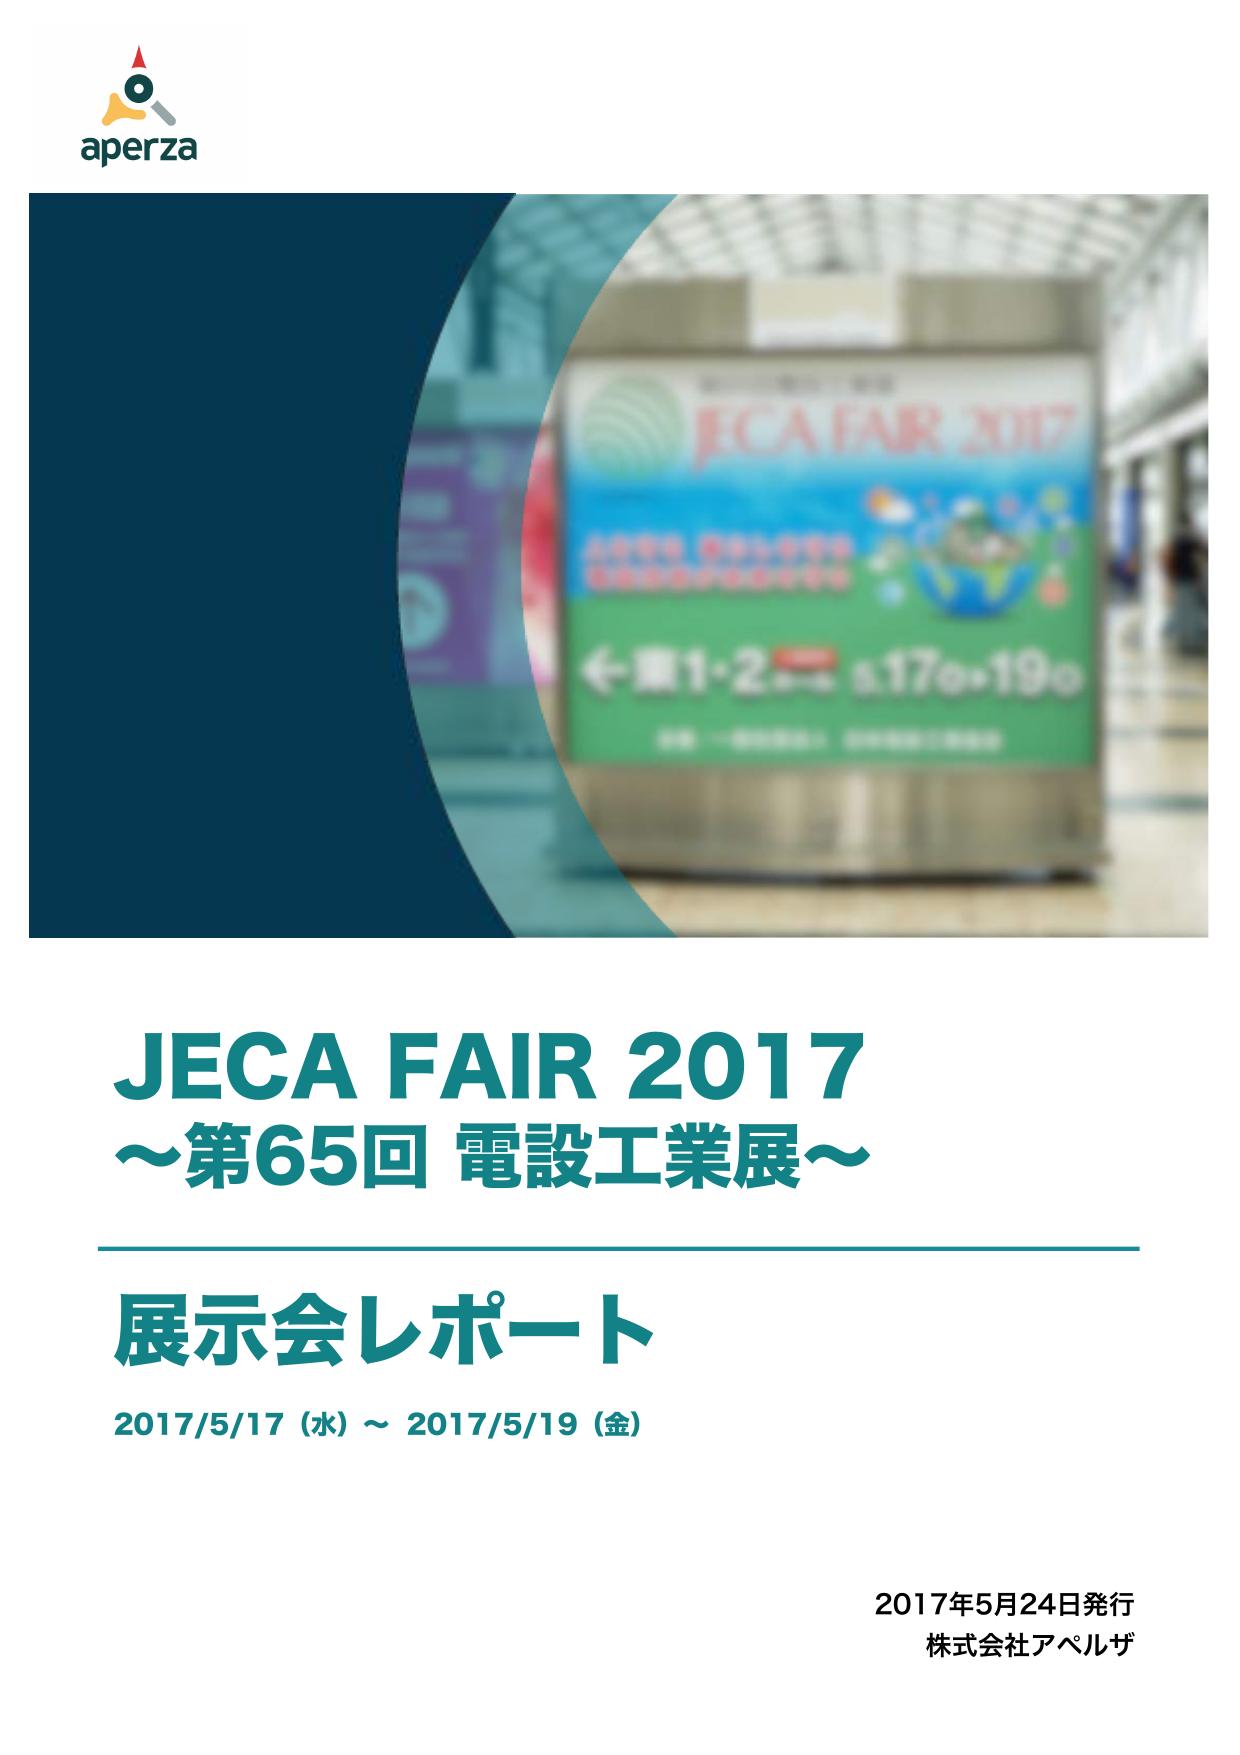 【展示会レポート】JECA FAIR 2017 ~第65回電設工業展~